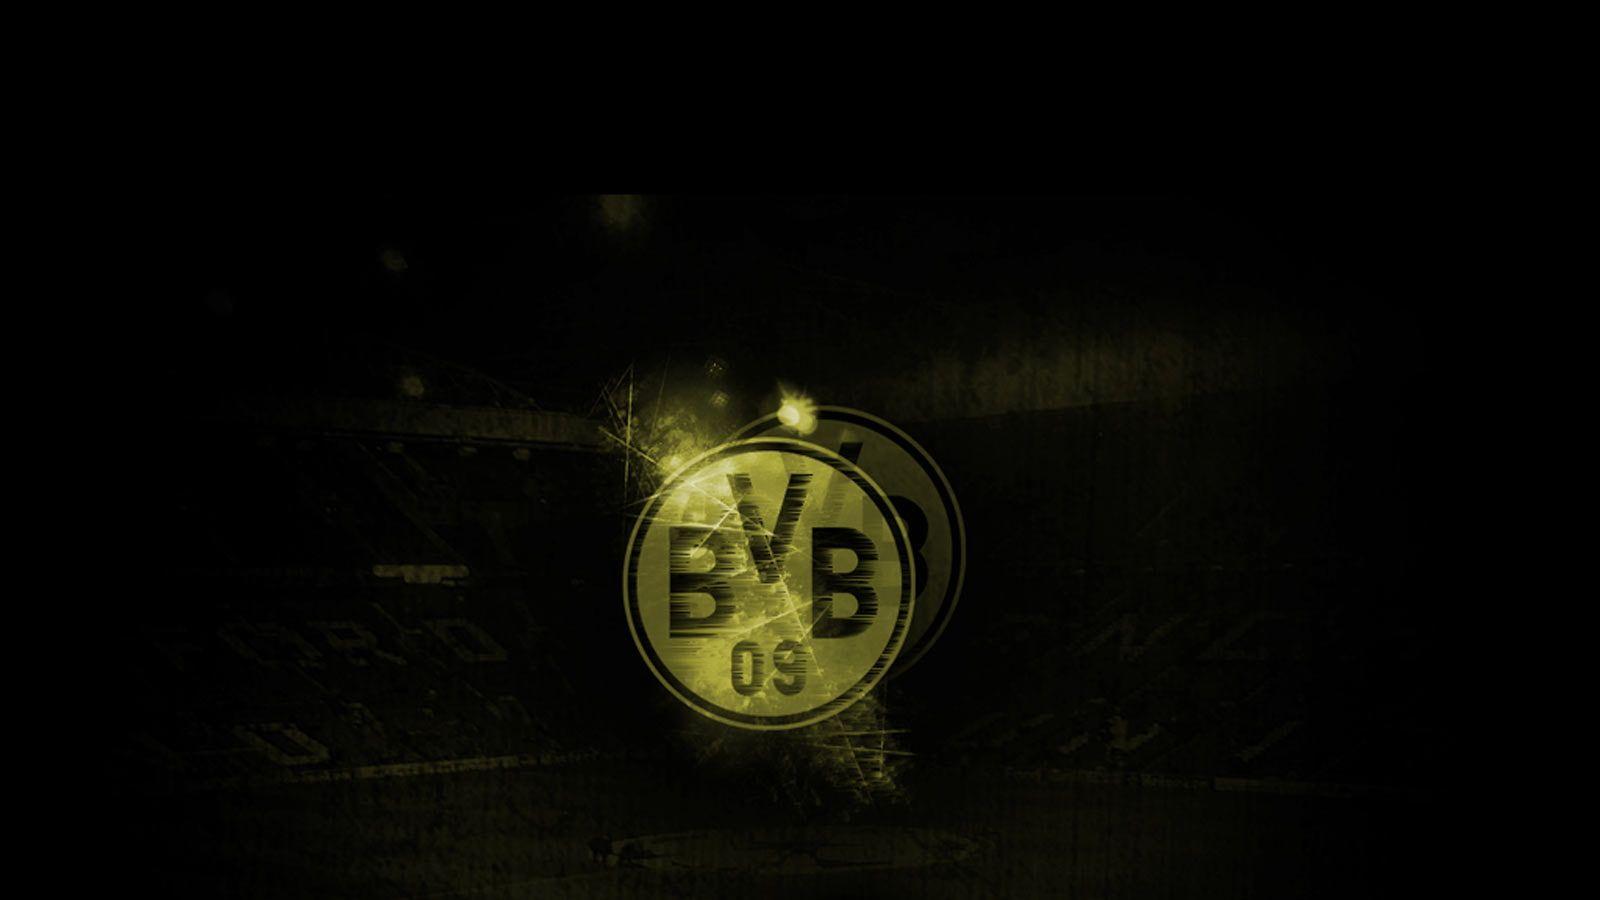 Borussia Dortmund Bundesliga Bvb Reus Borussia Dortmund Bundesliga Bvb Reus 720p Wallpaper Hdwa Borussia Dortmund Borussia Dortmund Wallpaper Dortmund